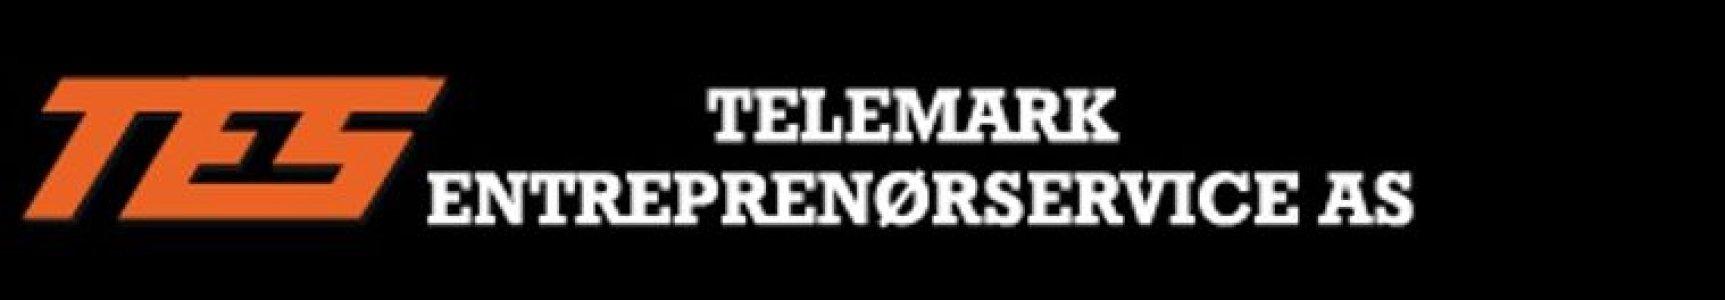 TES Telemark Entreprenørservice